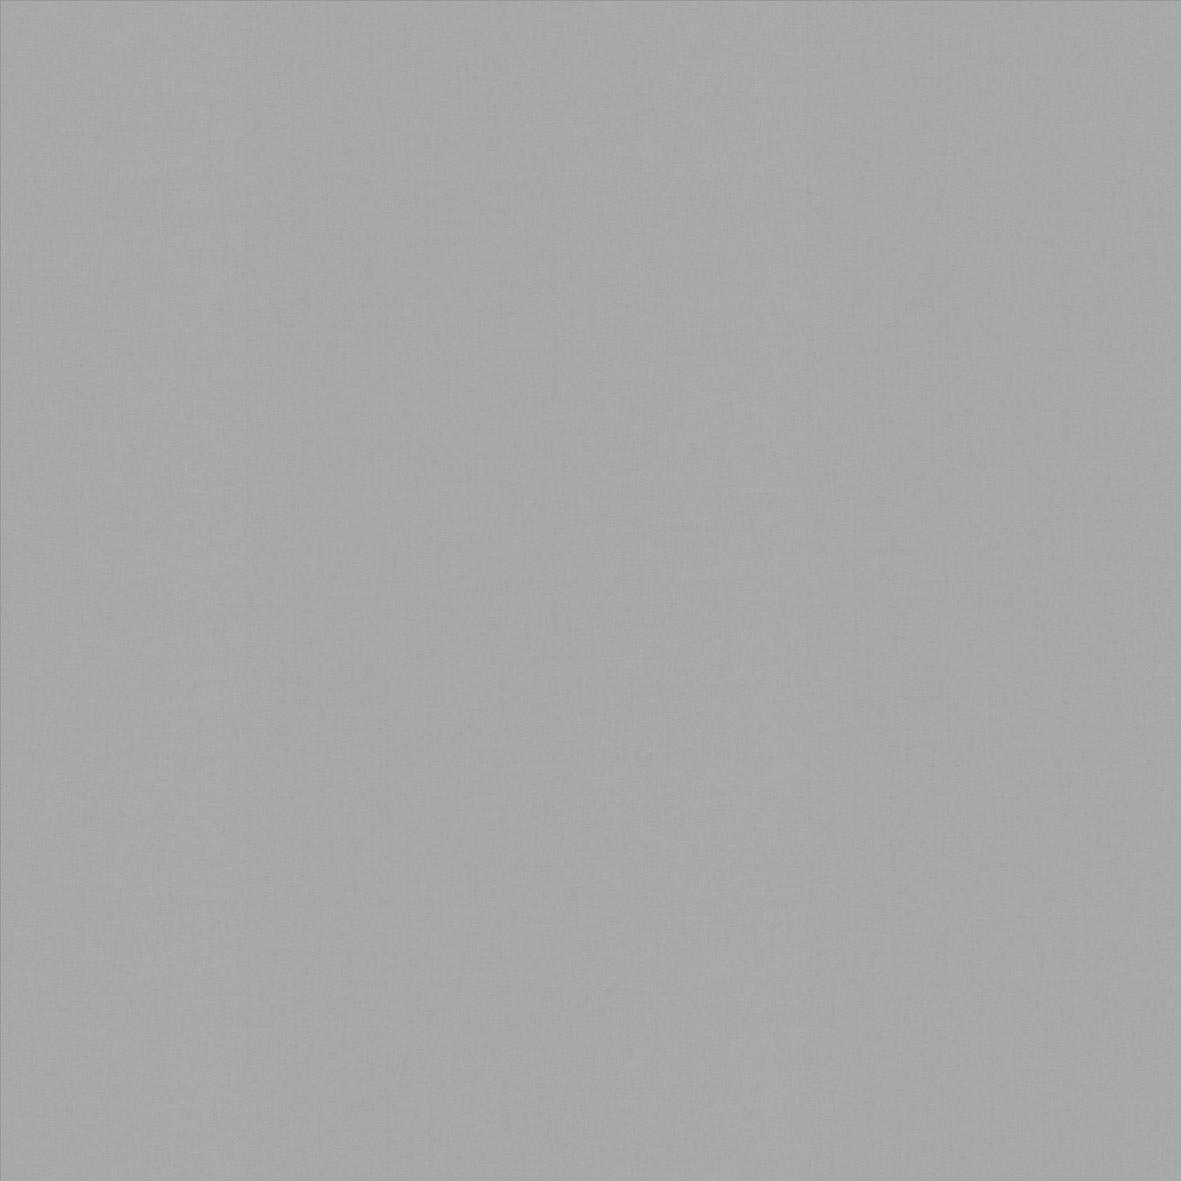 Roller_Swatch_Banlight_Duo_FR_Grey_RE0311